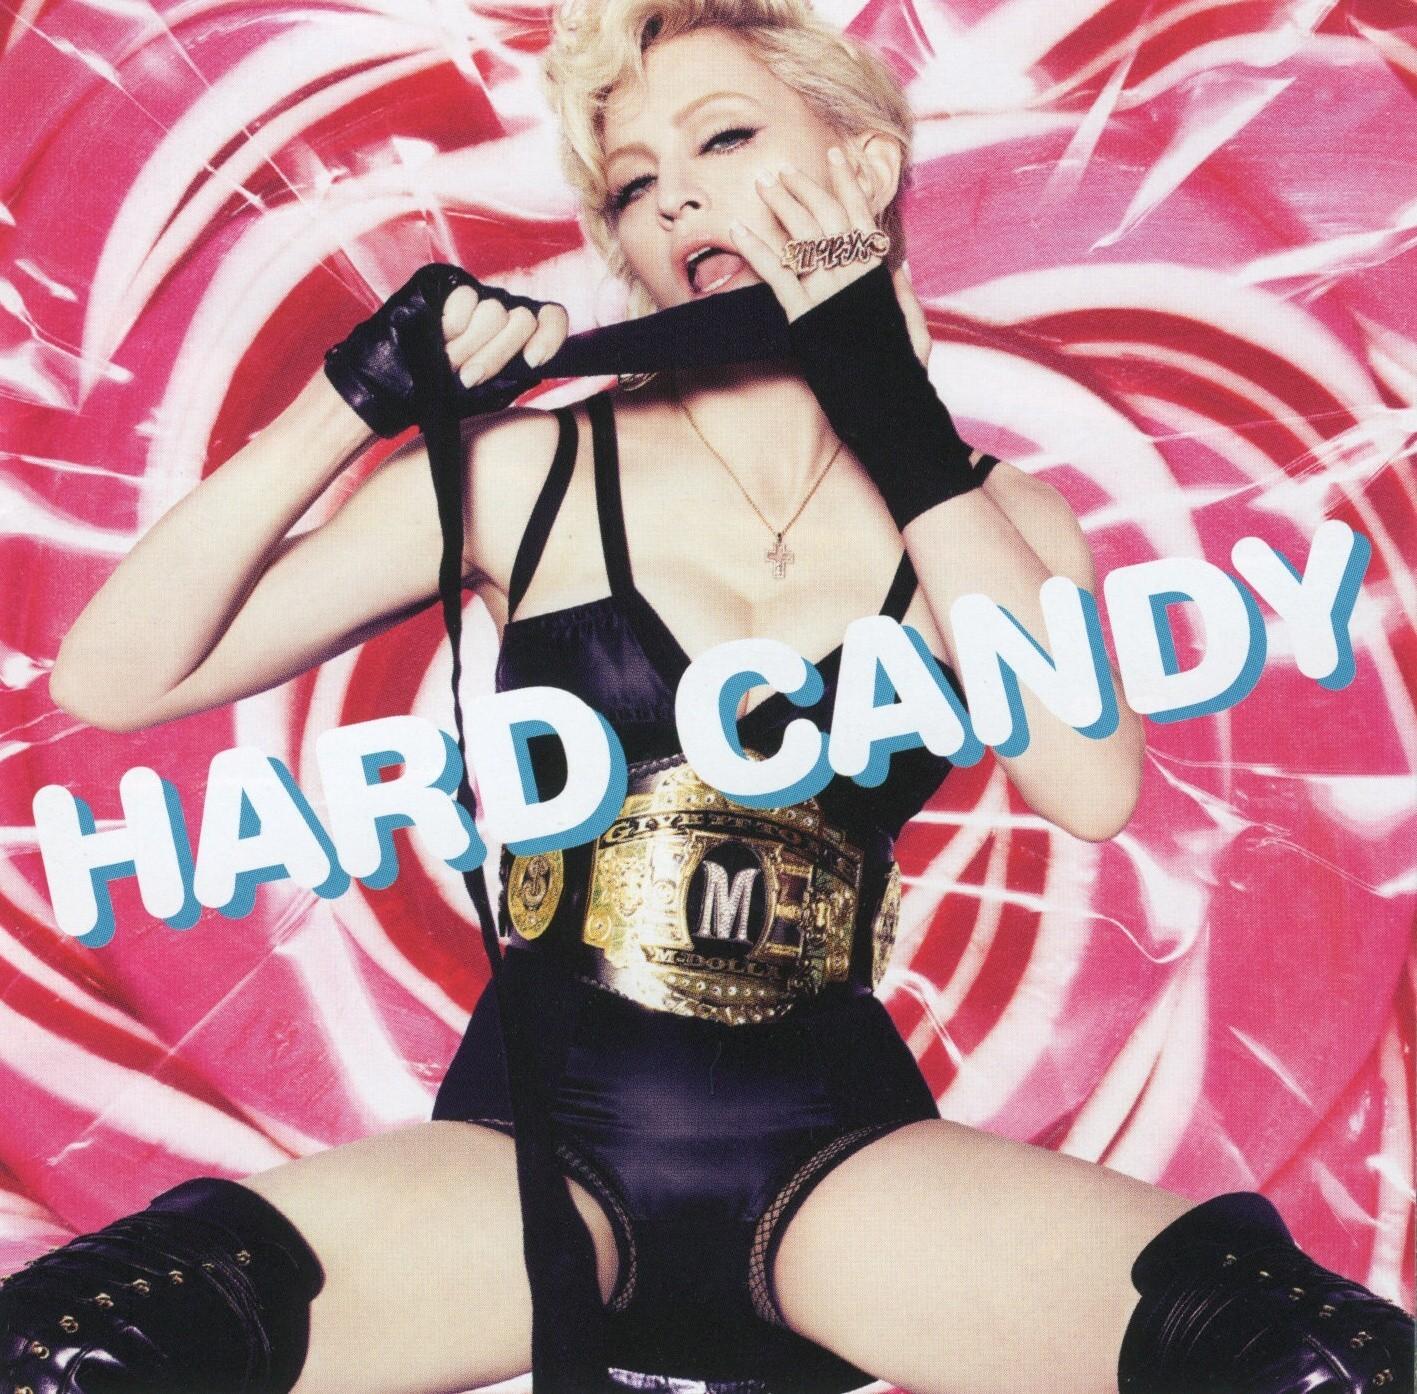 http://4.bp.blogspot.com/_vj2nlE0u2Z4/TUSOm2LG-RI/AAAAAAAAAb4/zV1ijdDCe04/s1600/Madonna+-+Hard+Candy+%255BFront%255D.jpg